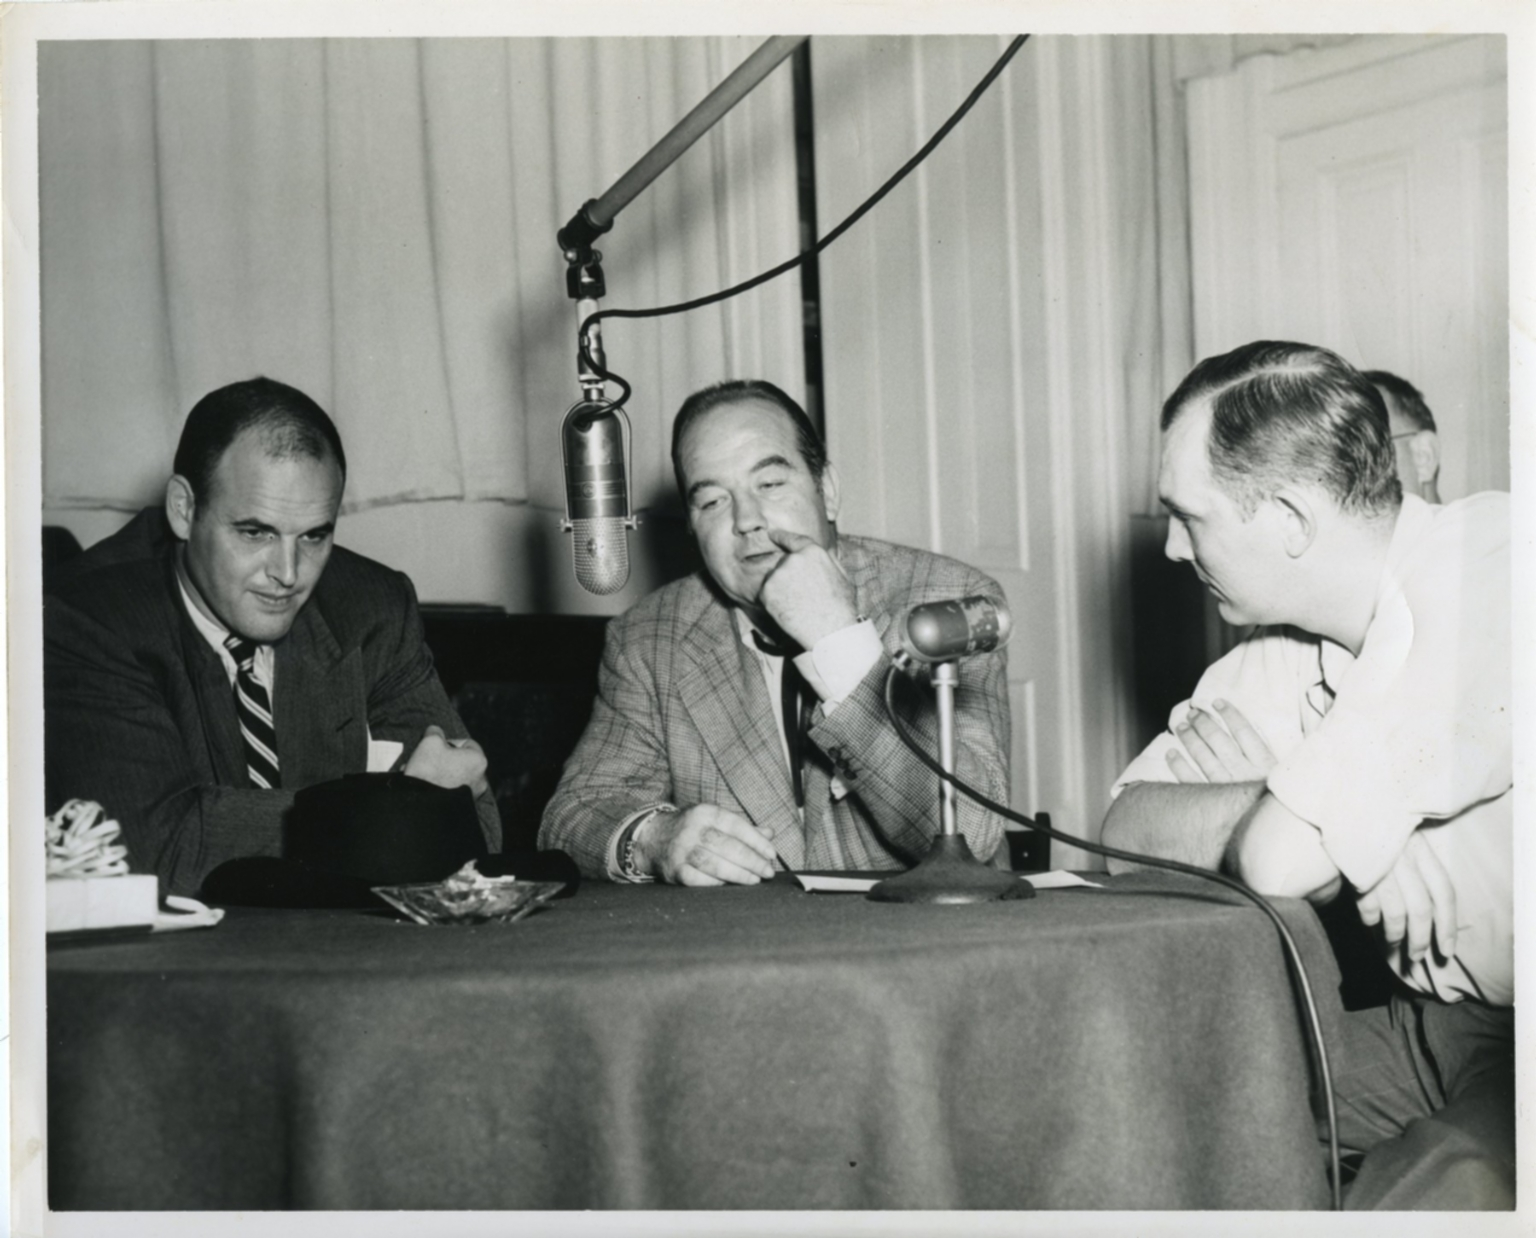 Broderick Crawford Radio